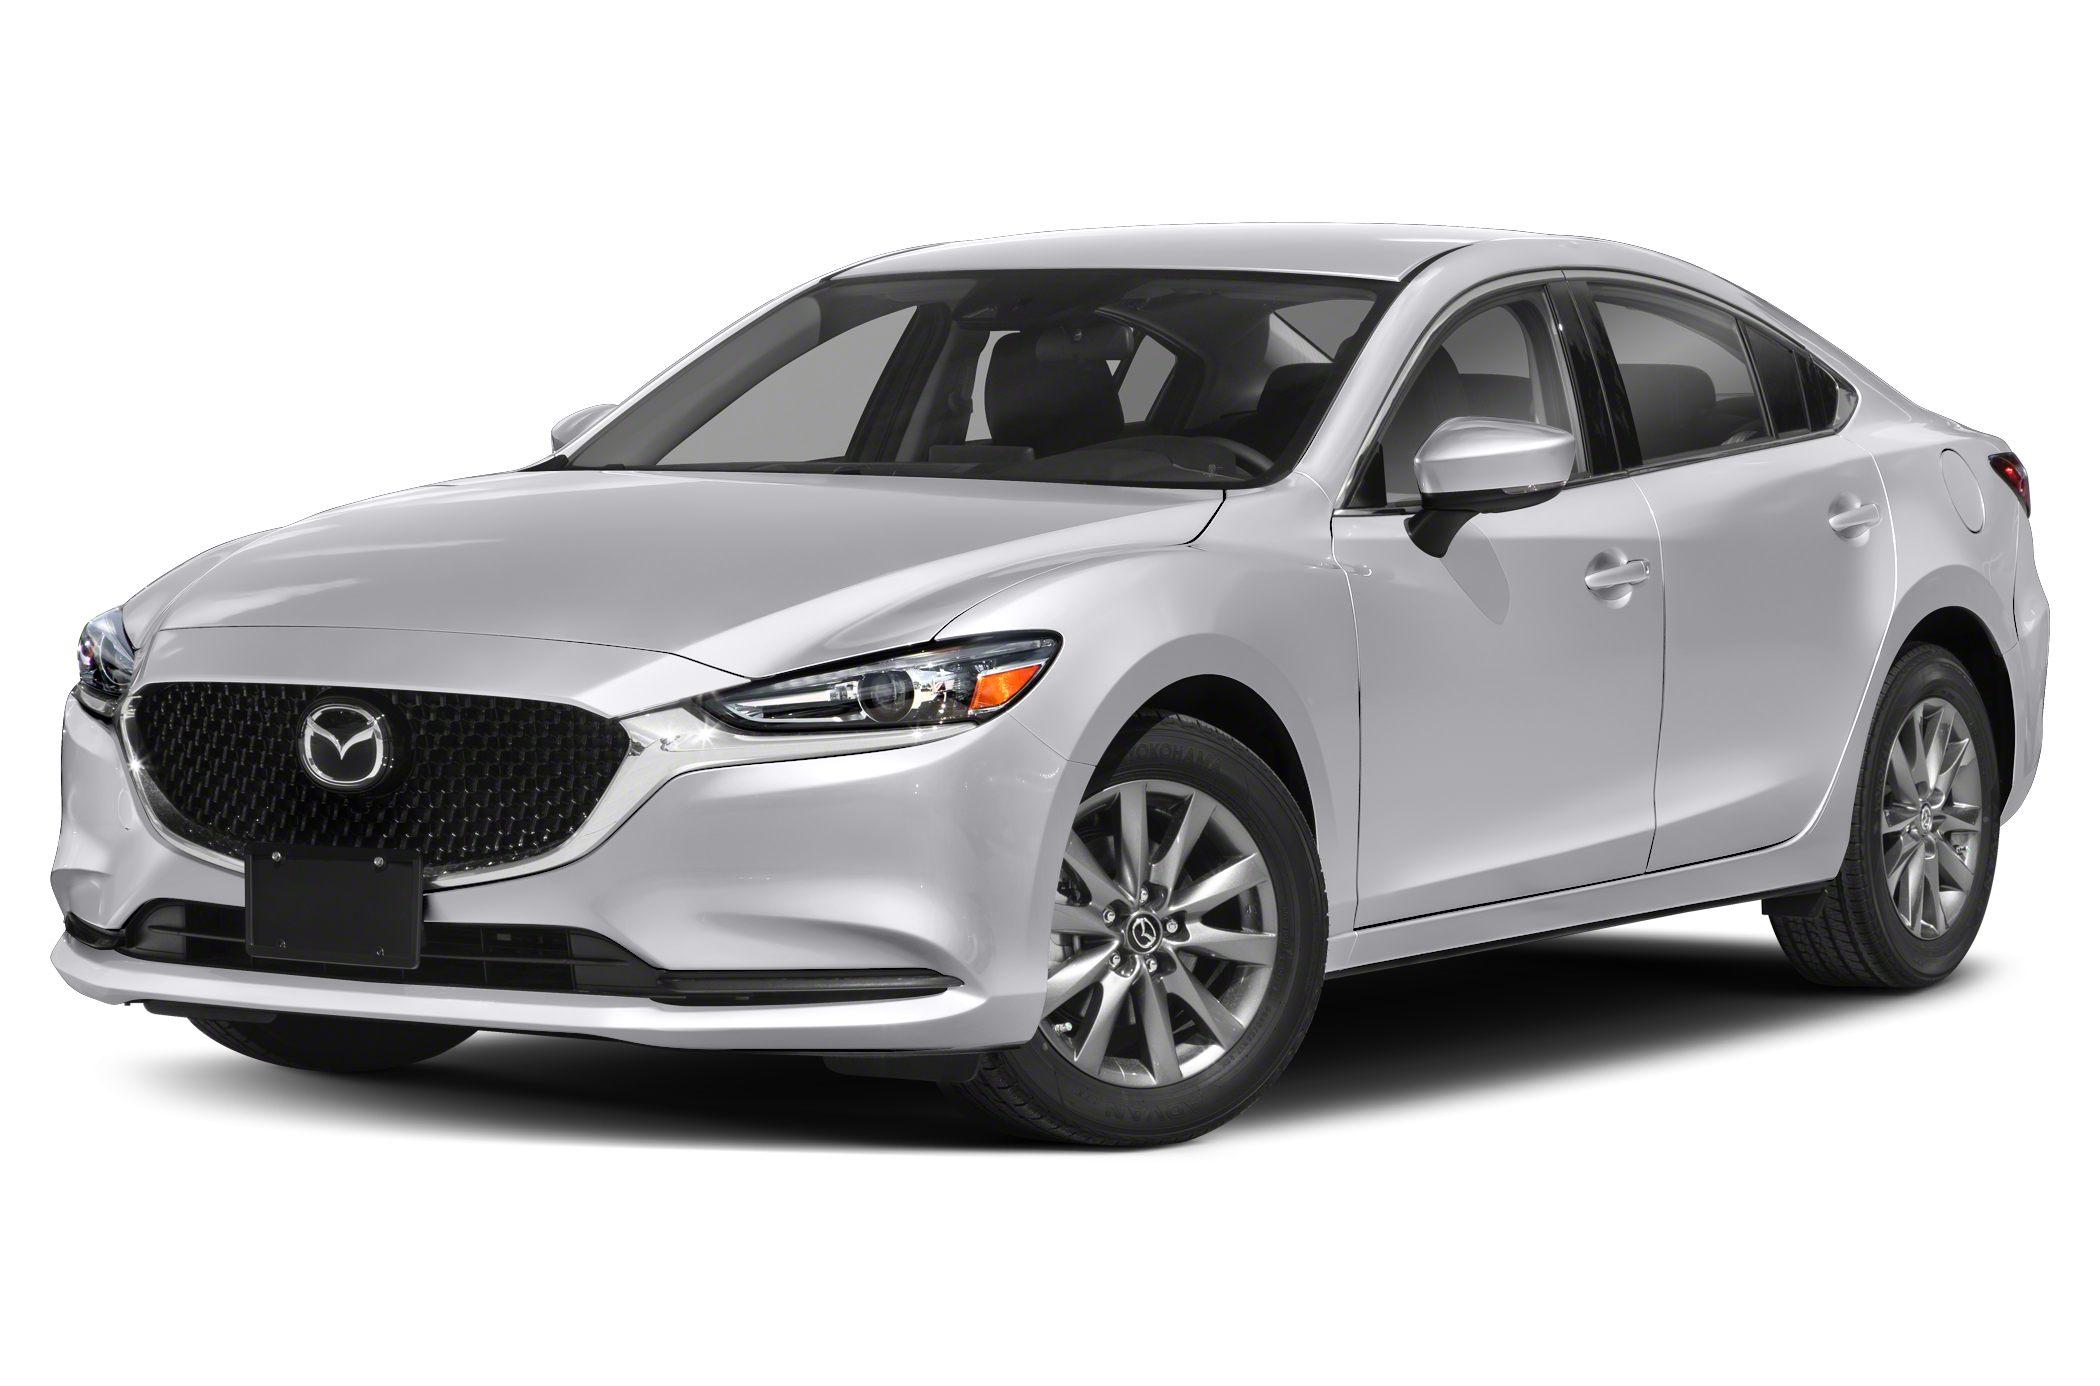 Kelebihan Kekurangan Mazda Mazda6 Harga